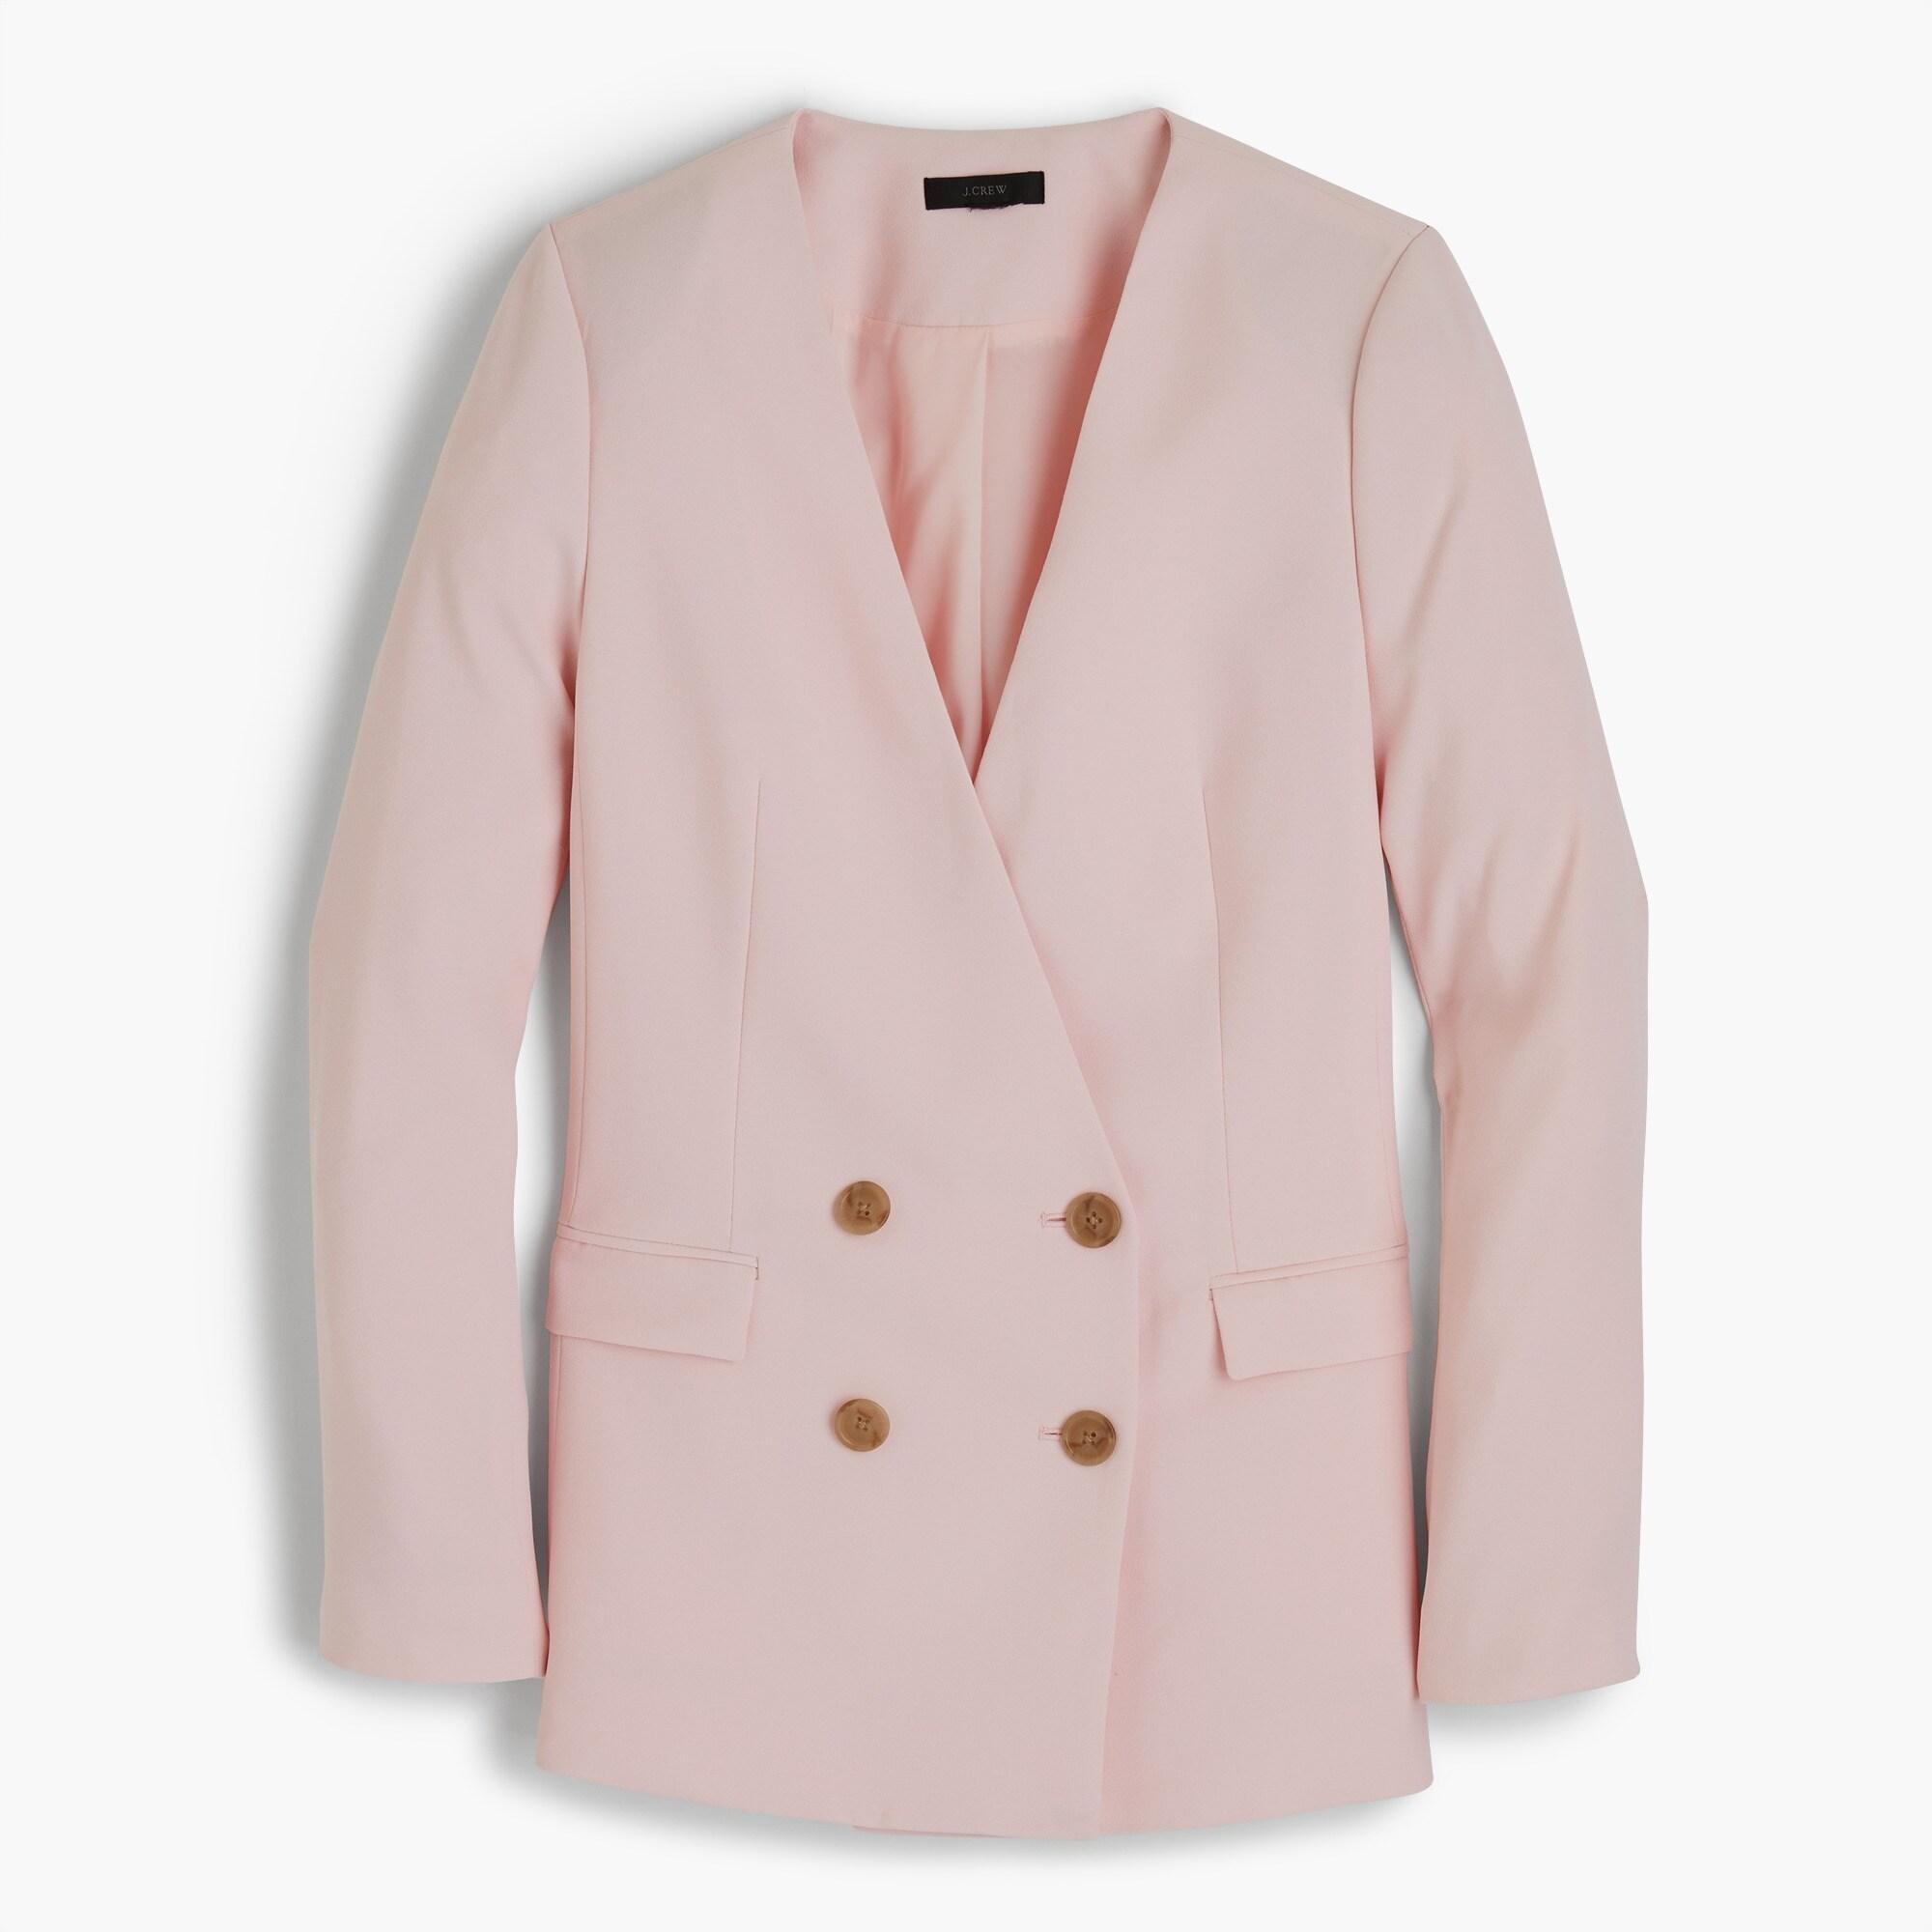 women's french girl blazer in 365 crepe - women's suit separates